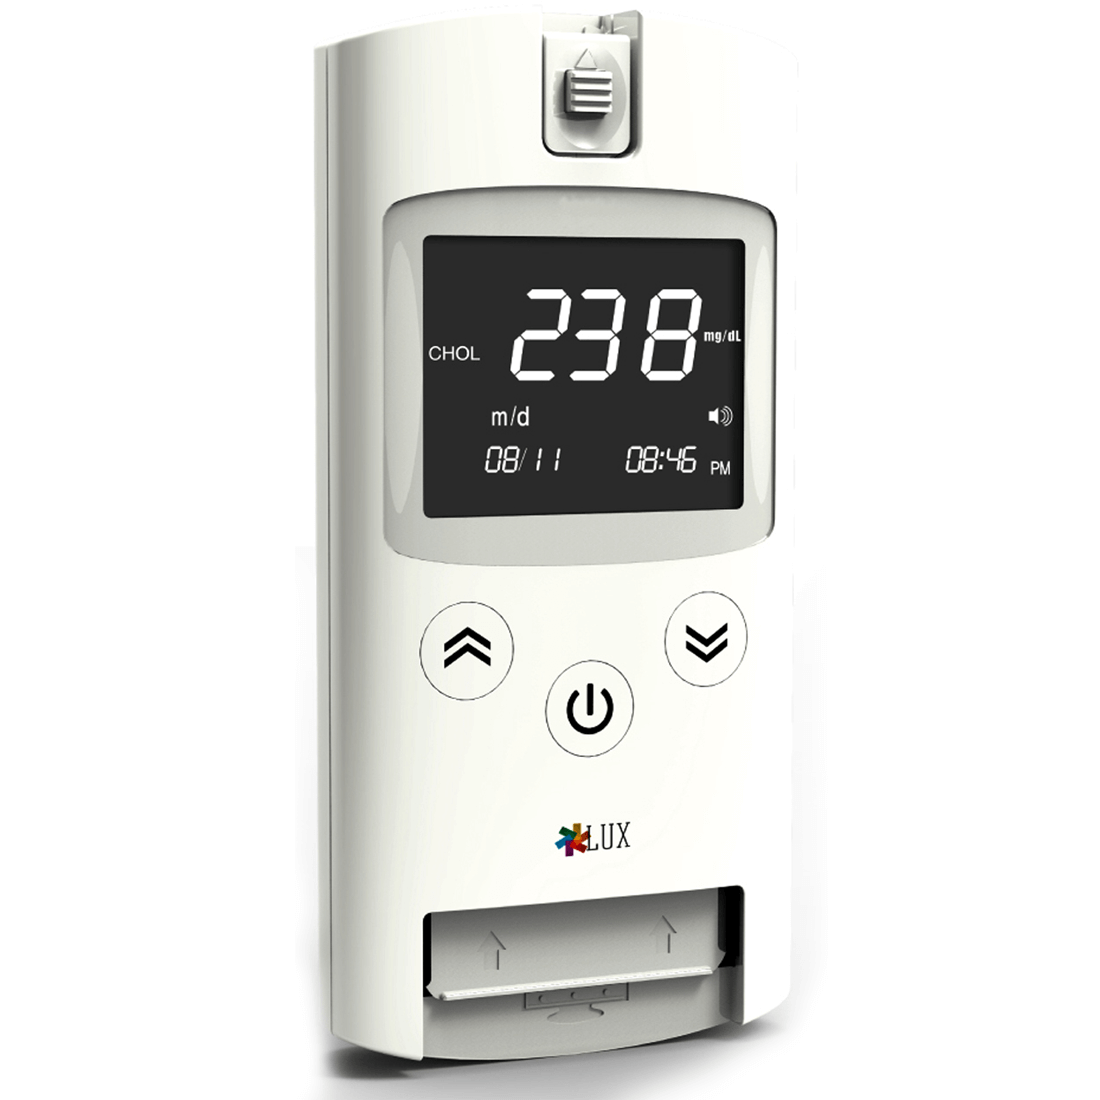 LUX Multiparameter POCT Device   For Triglycerides-Cholesterol-HDL-LDL-Haemoglobin